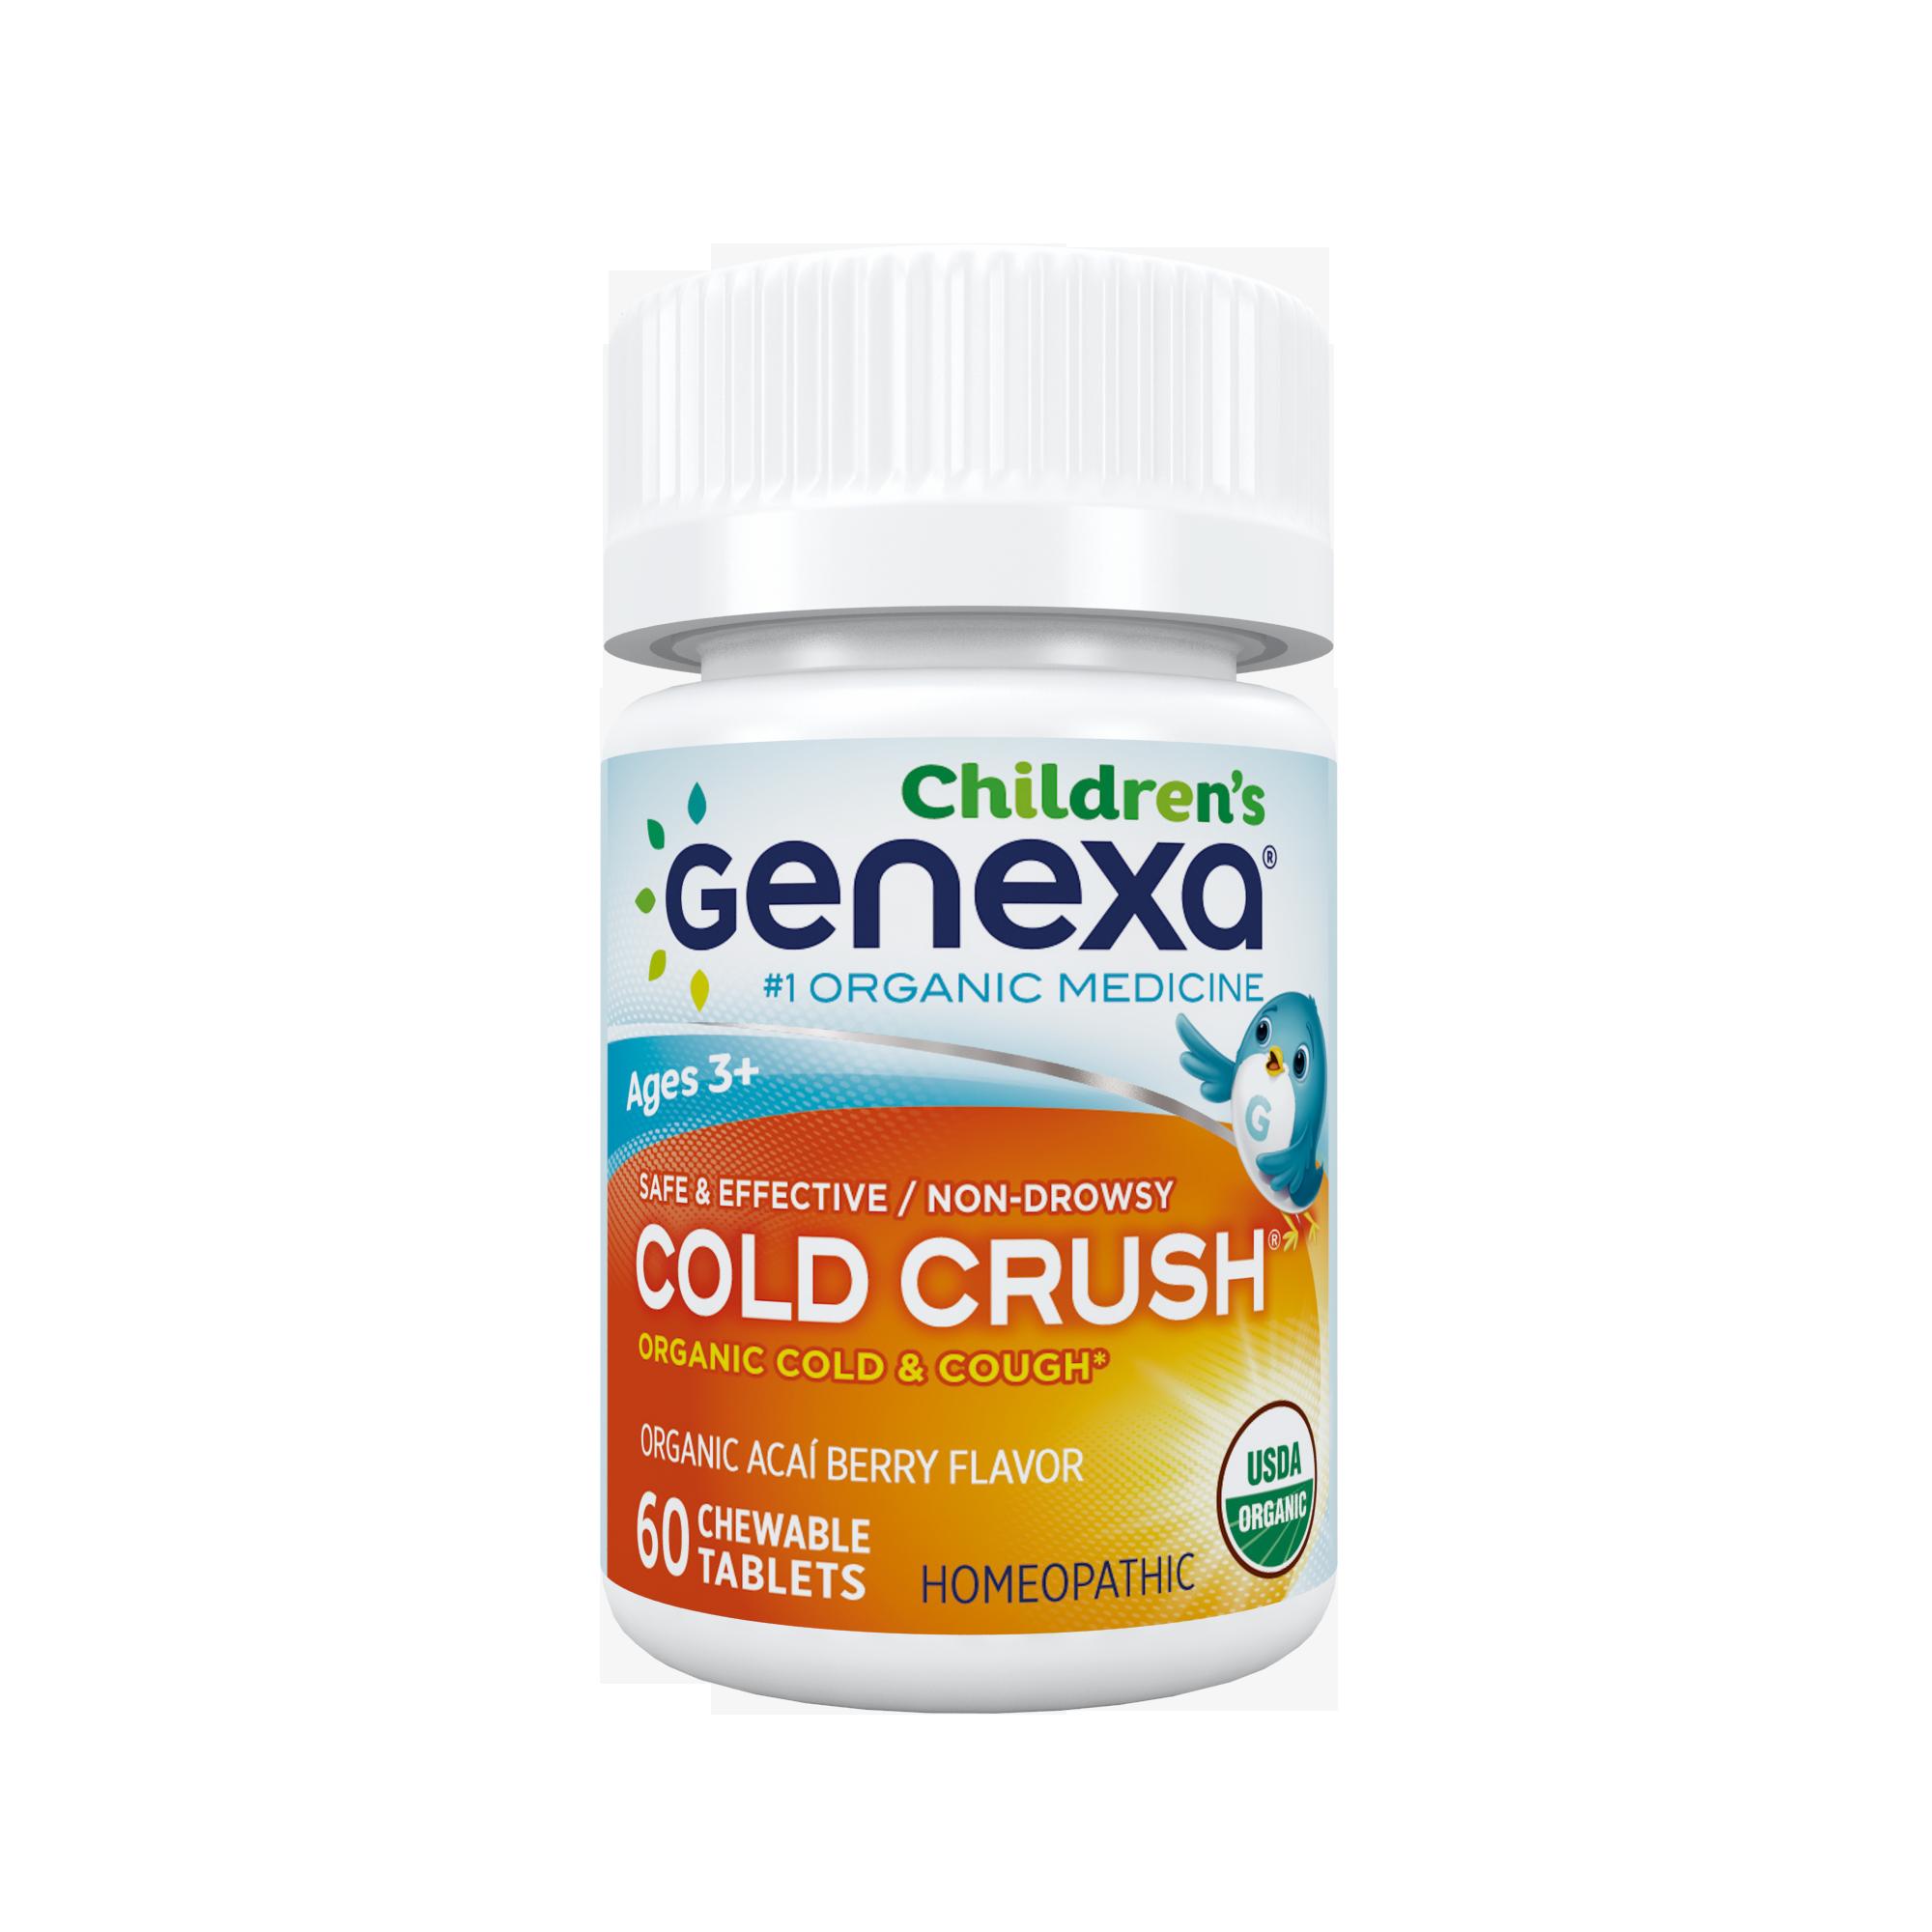 Genexa homeopathic cold crush. Cough clipart liquid medicine